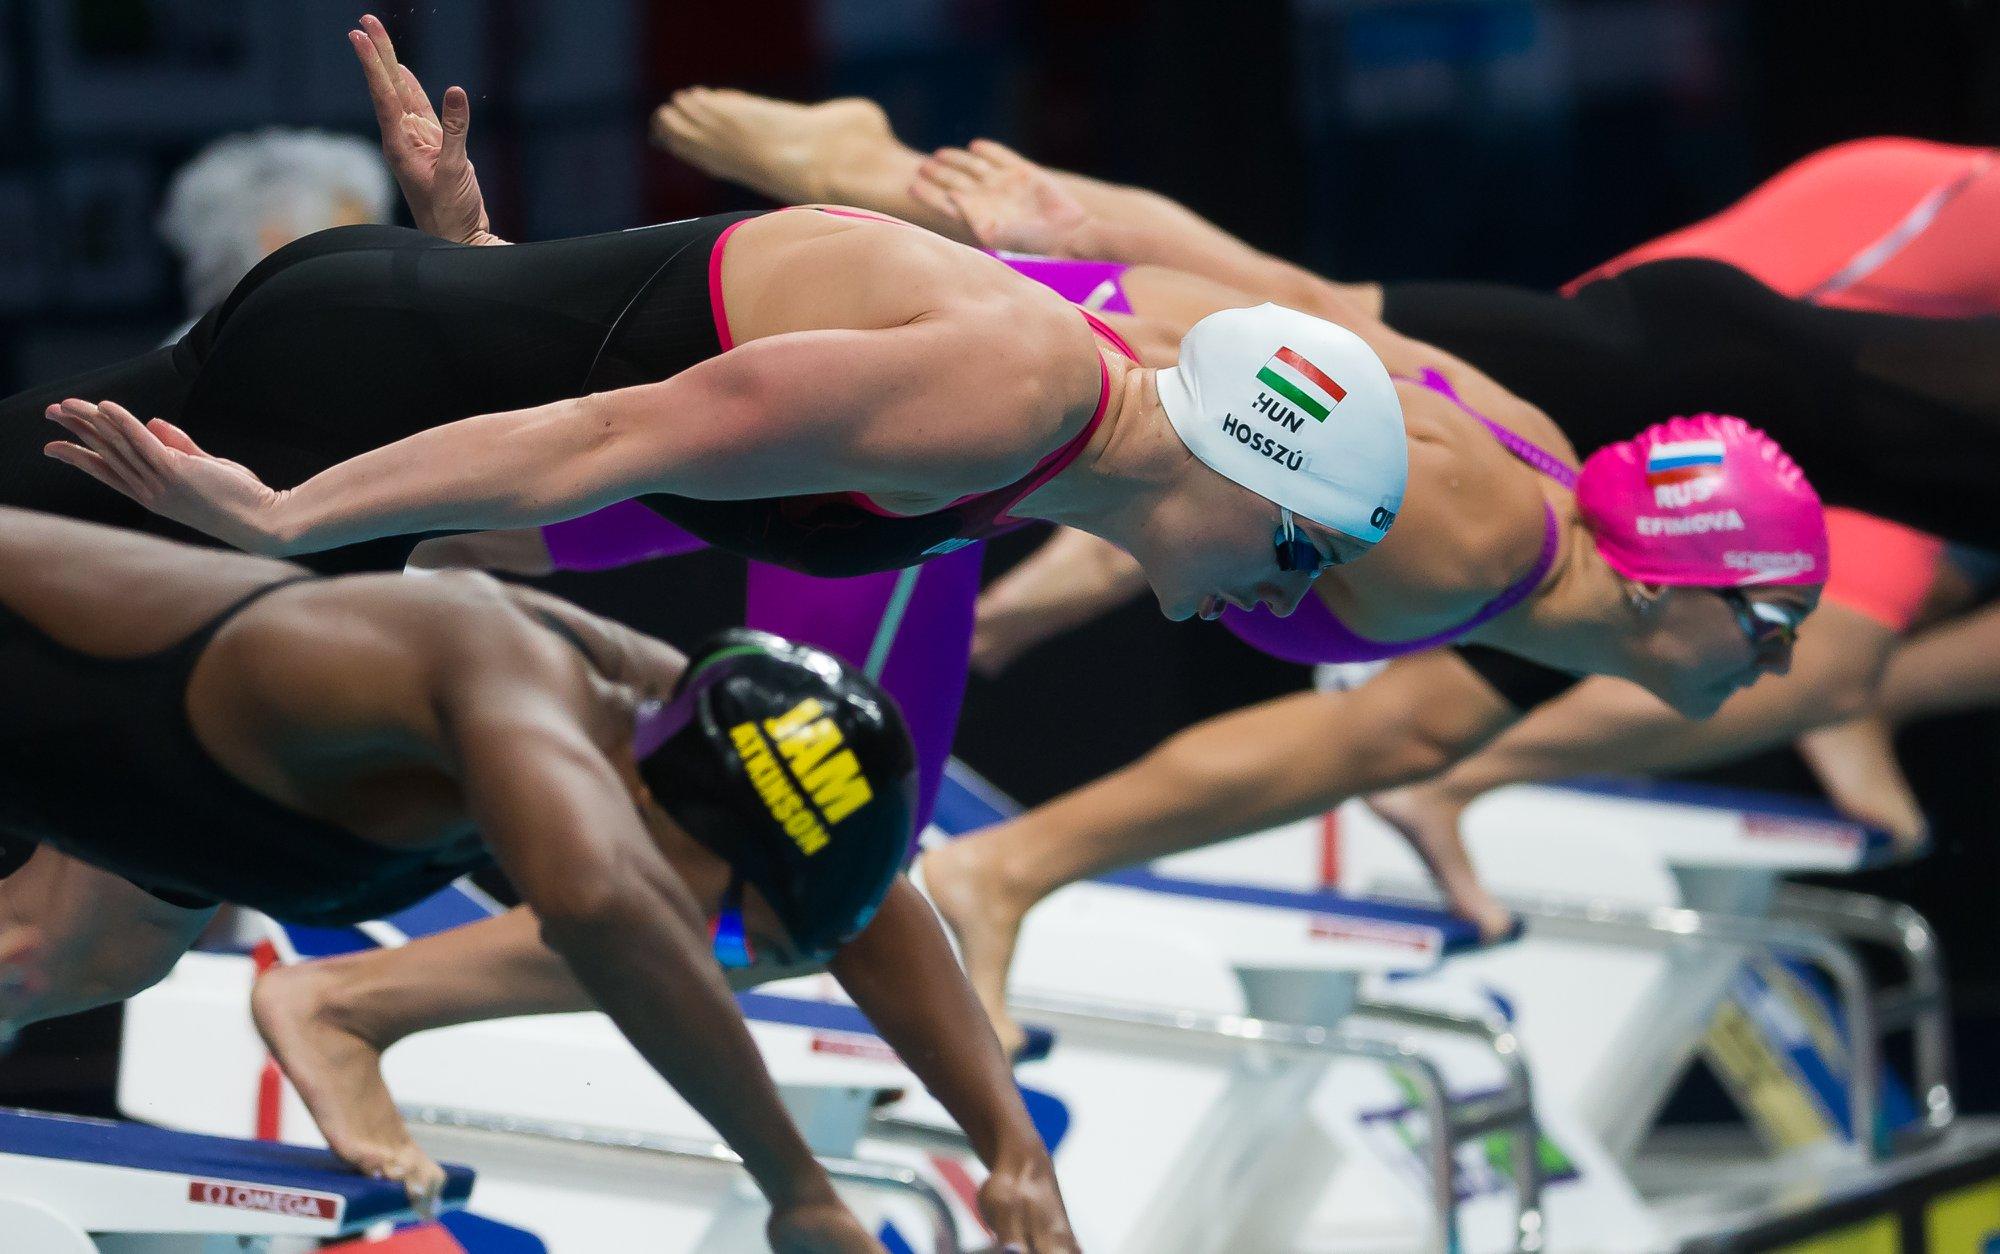 Duna Aréna, Katinka Hosszú, swimming, FINA, competition